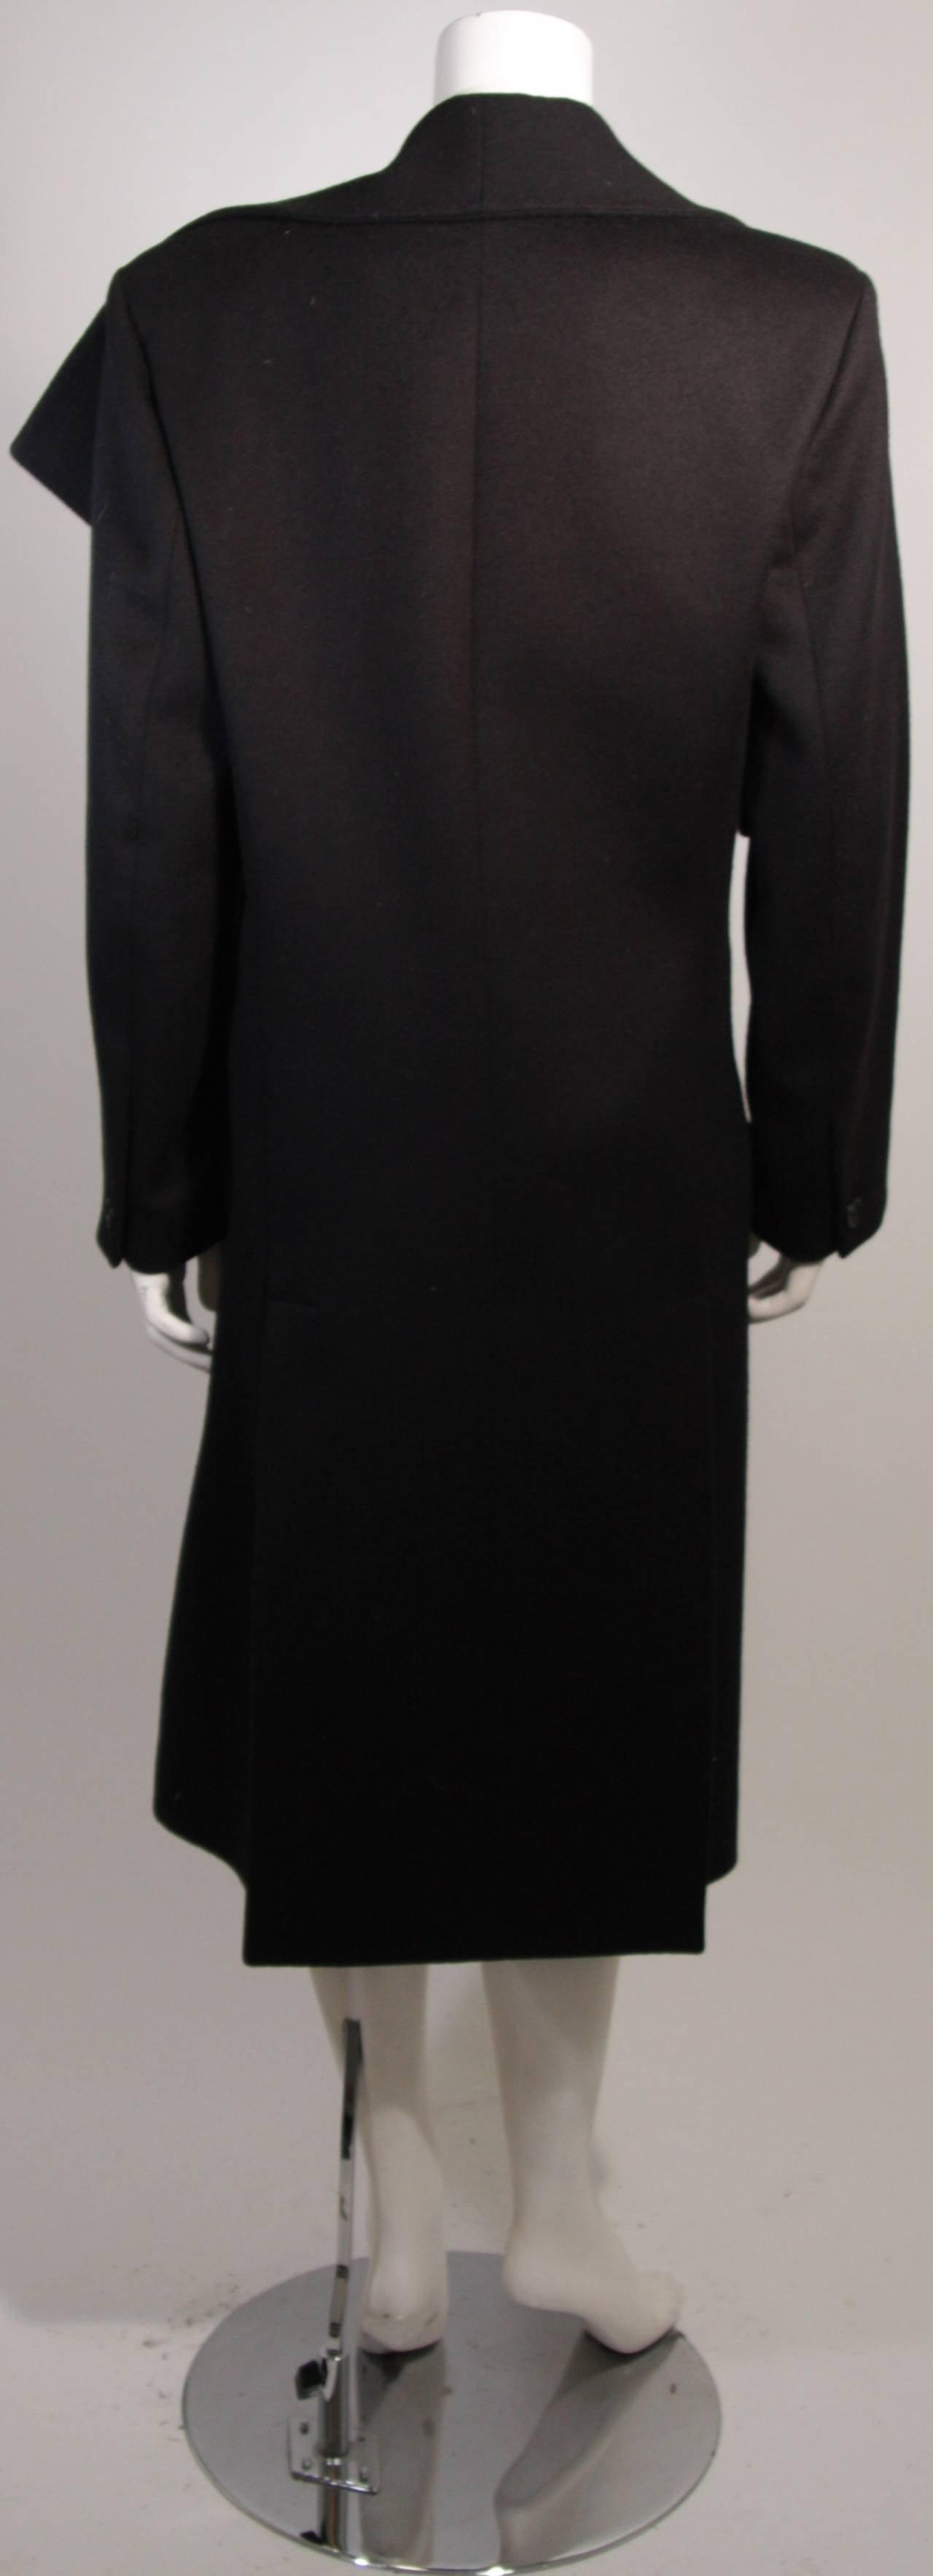 John Galliano Over-Sized Asymmetrical Collar Coat Size 10 42 For Sale 4